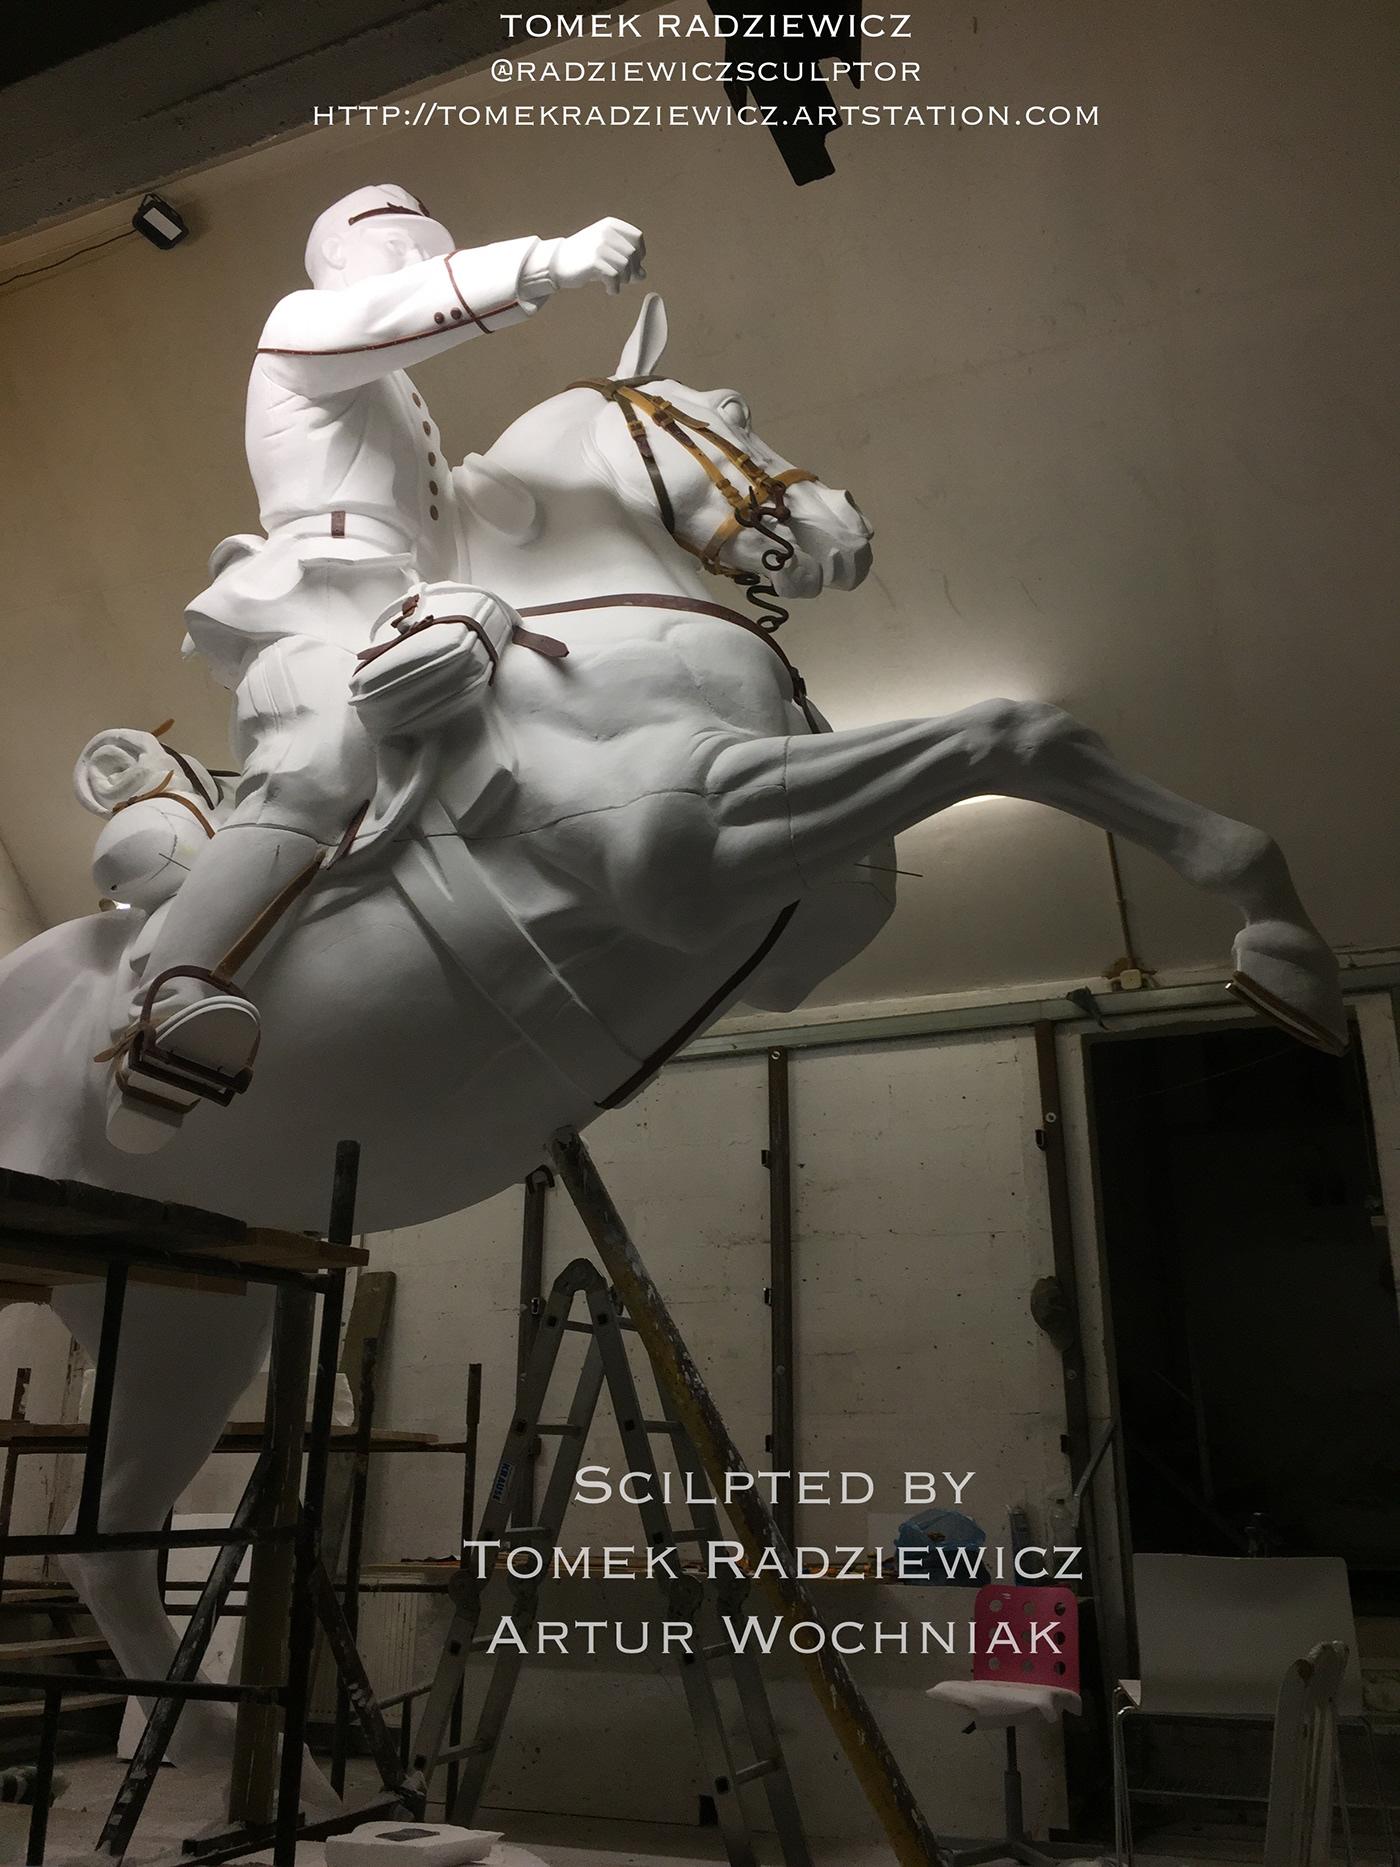 Character interiordesign sculpture